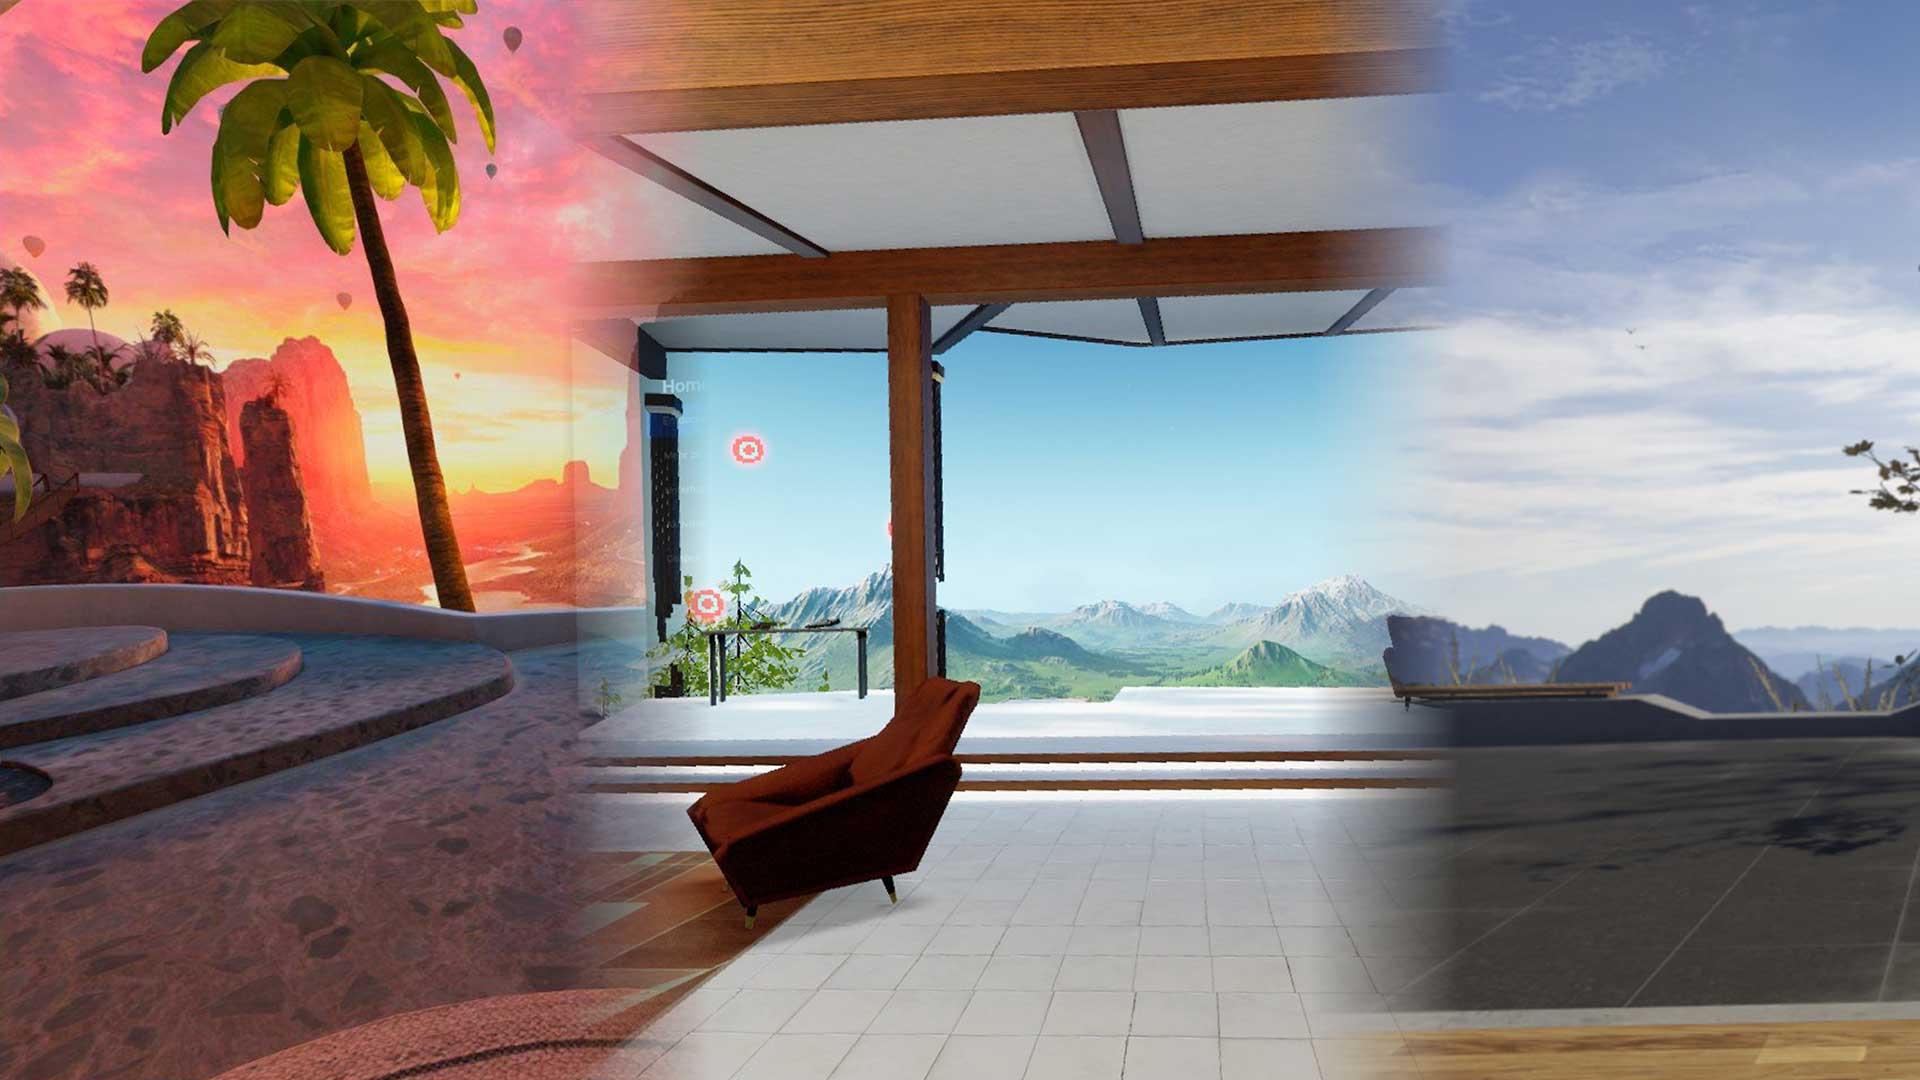 oculus quest 2 vr environments